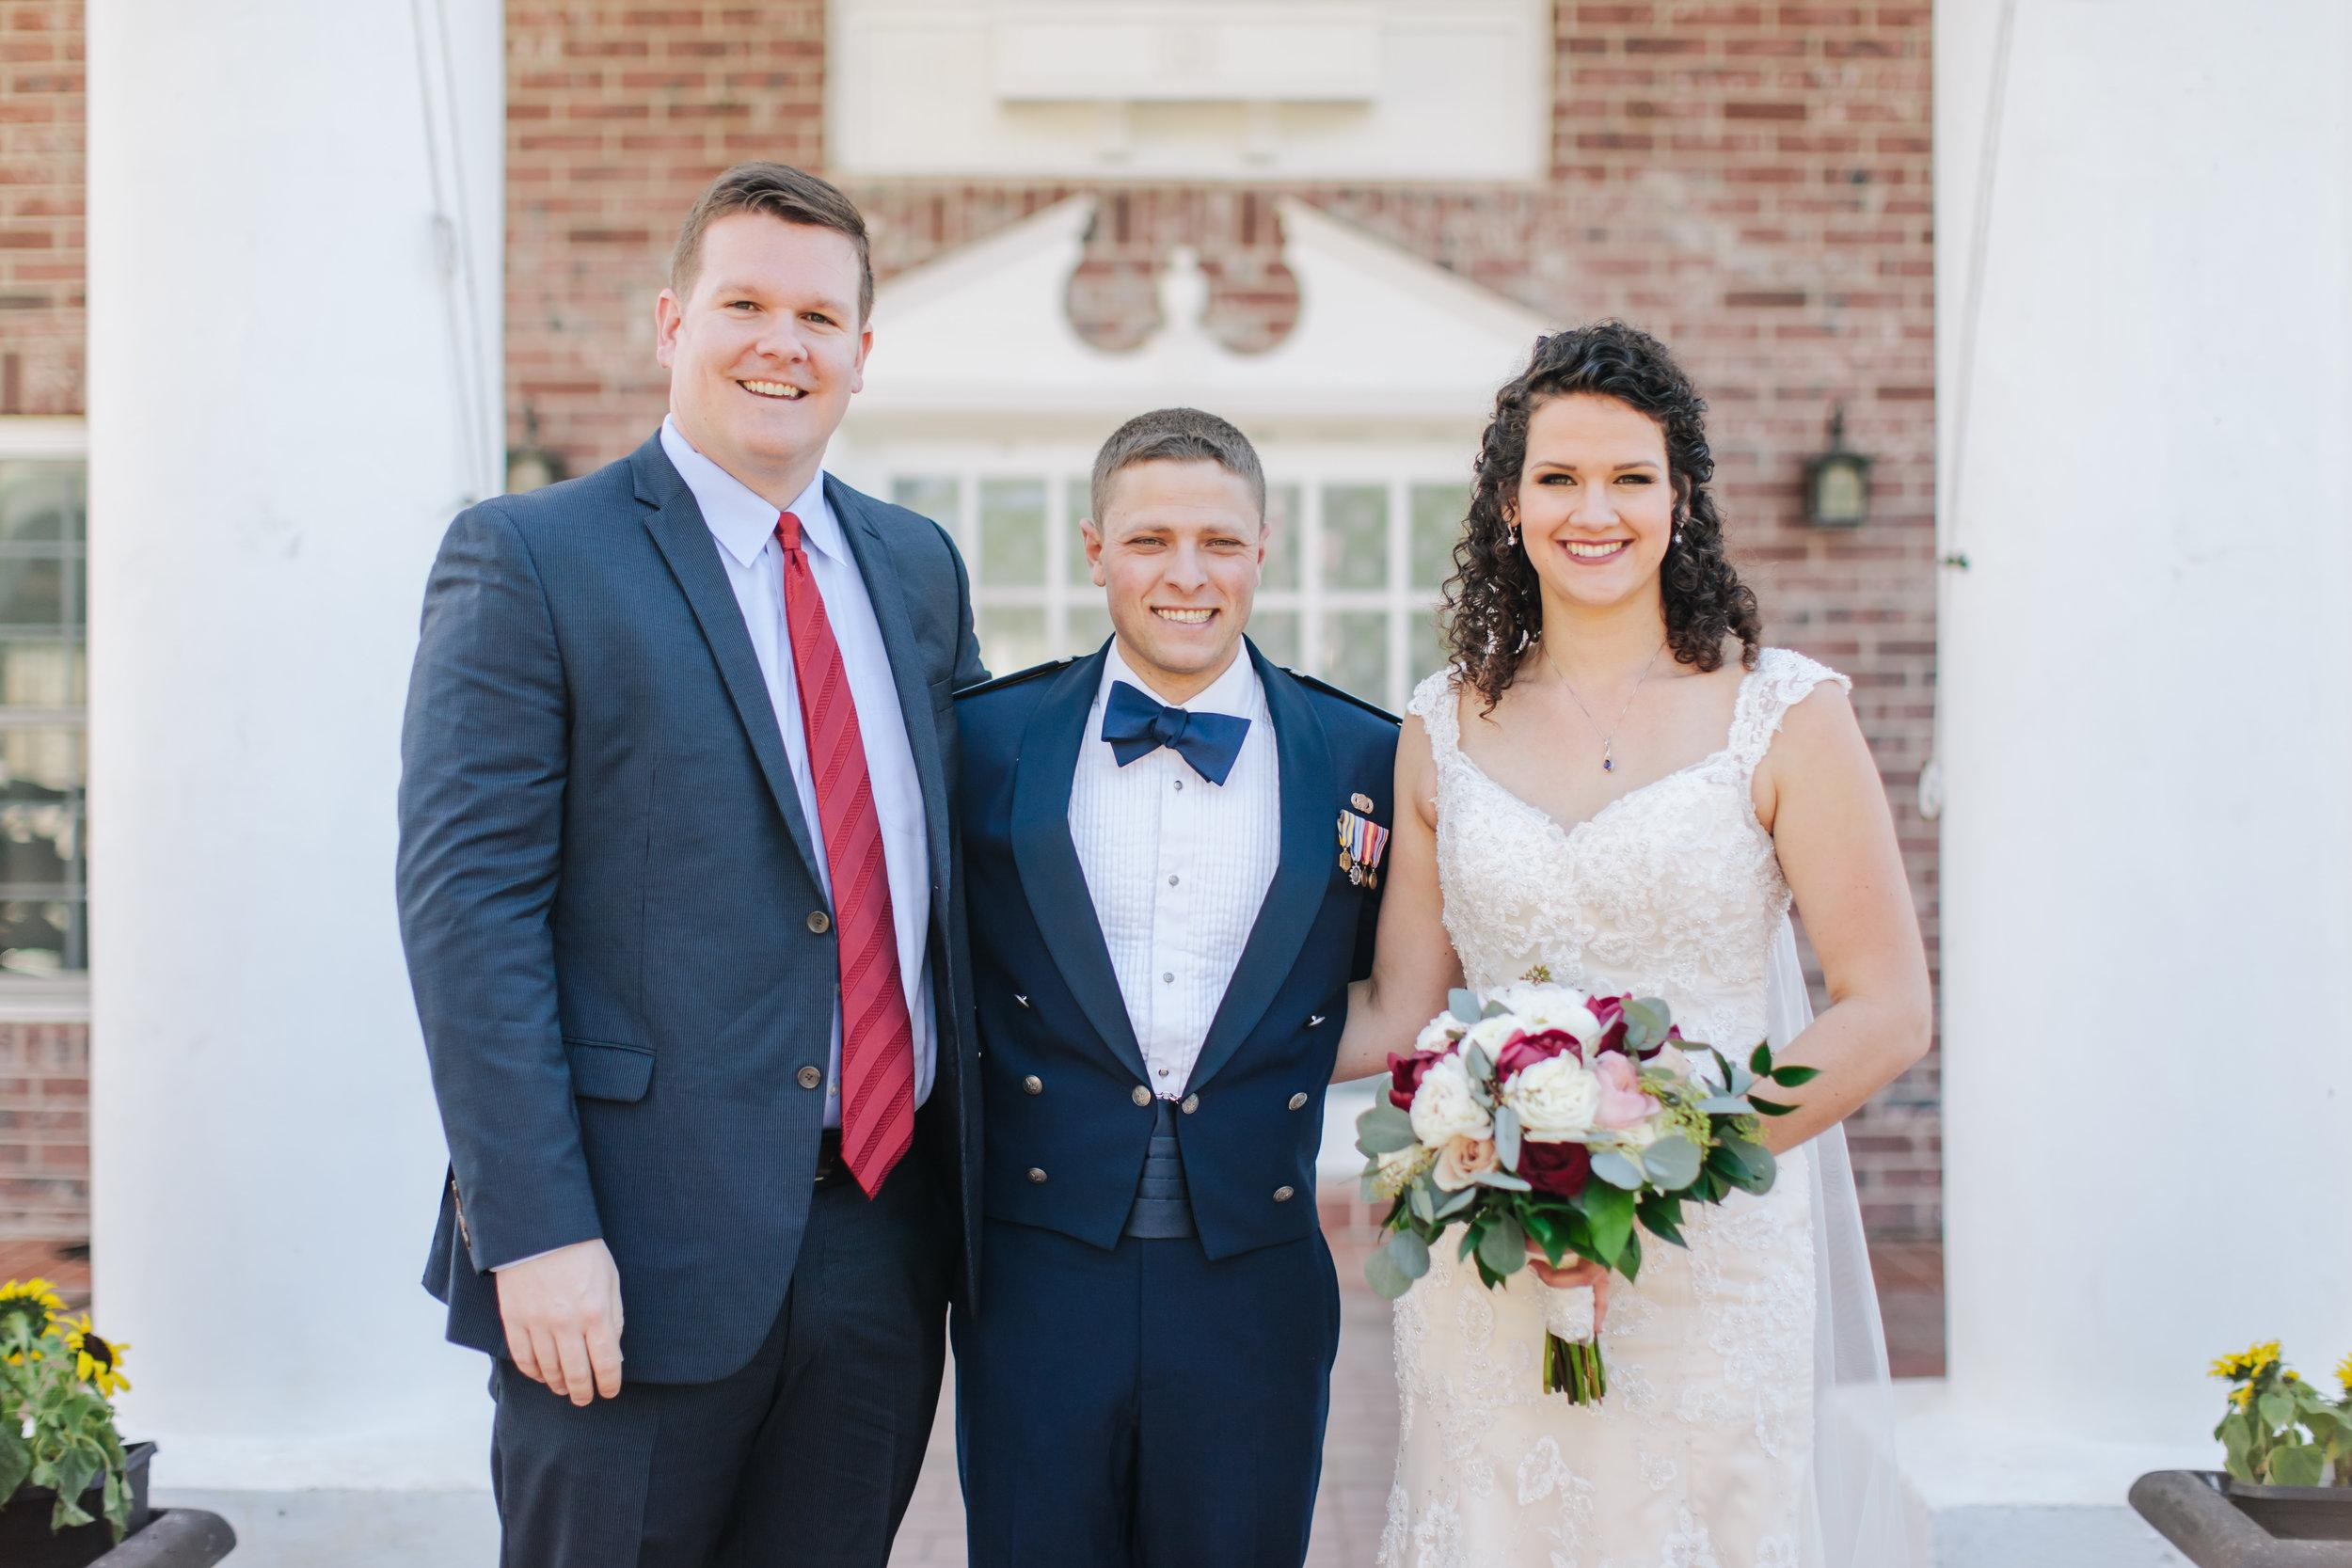 2018.03.17 Allison and Chuck Wedding Waelti Melbourne (439 of 569).jpg